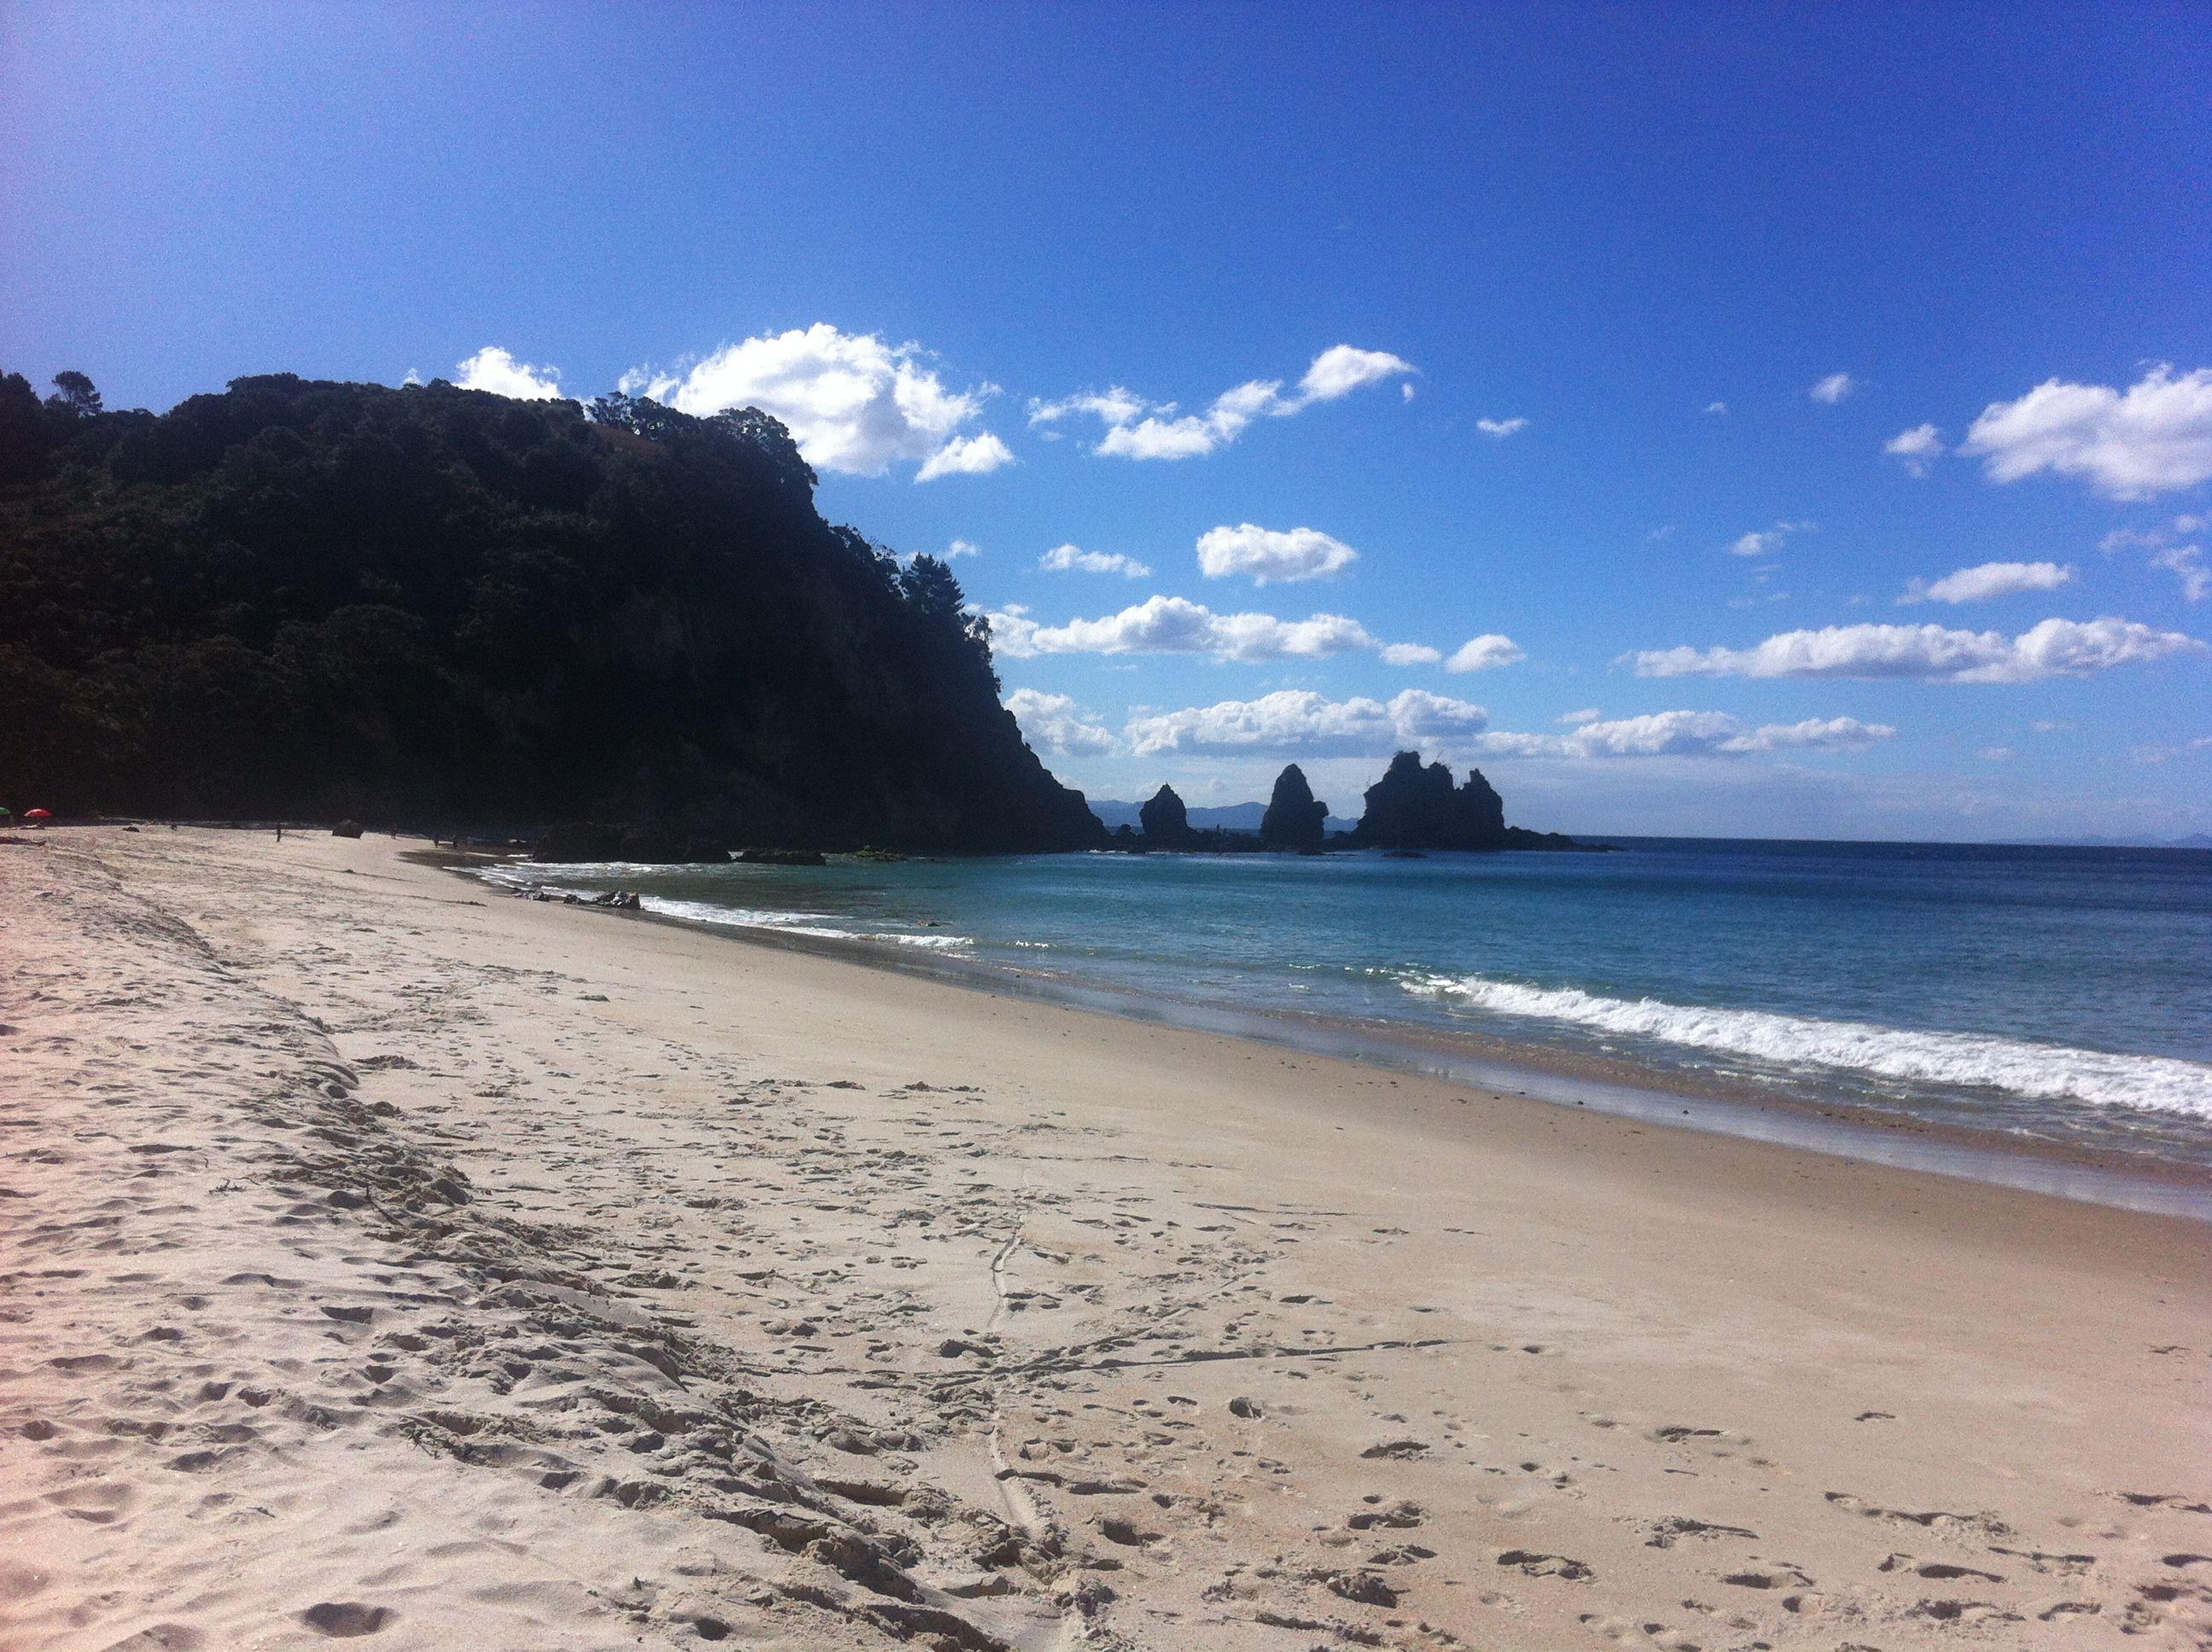 #12 sunny beach days in the coromandel!